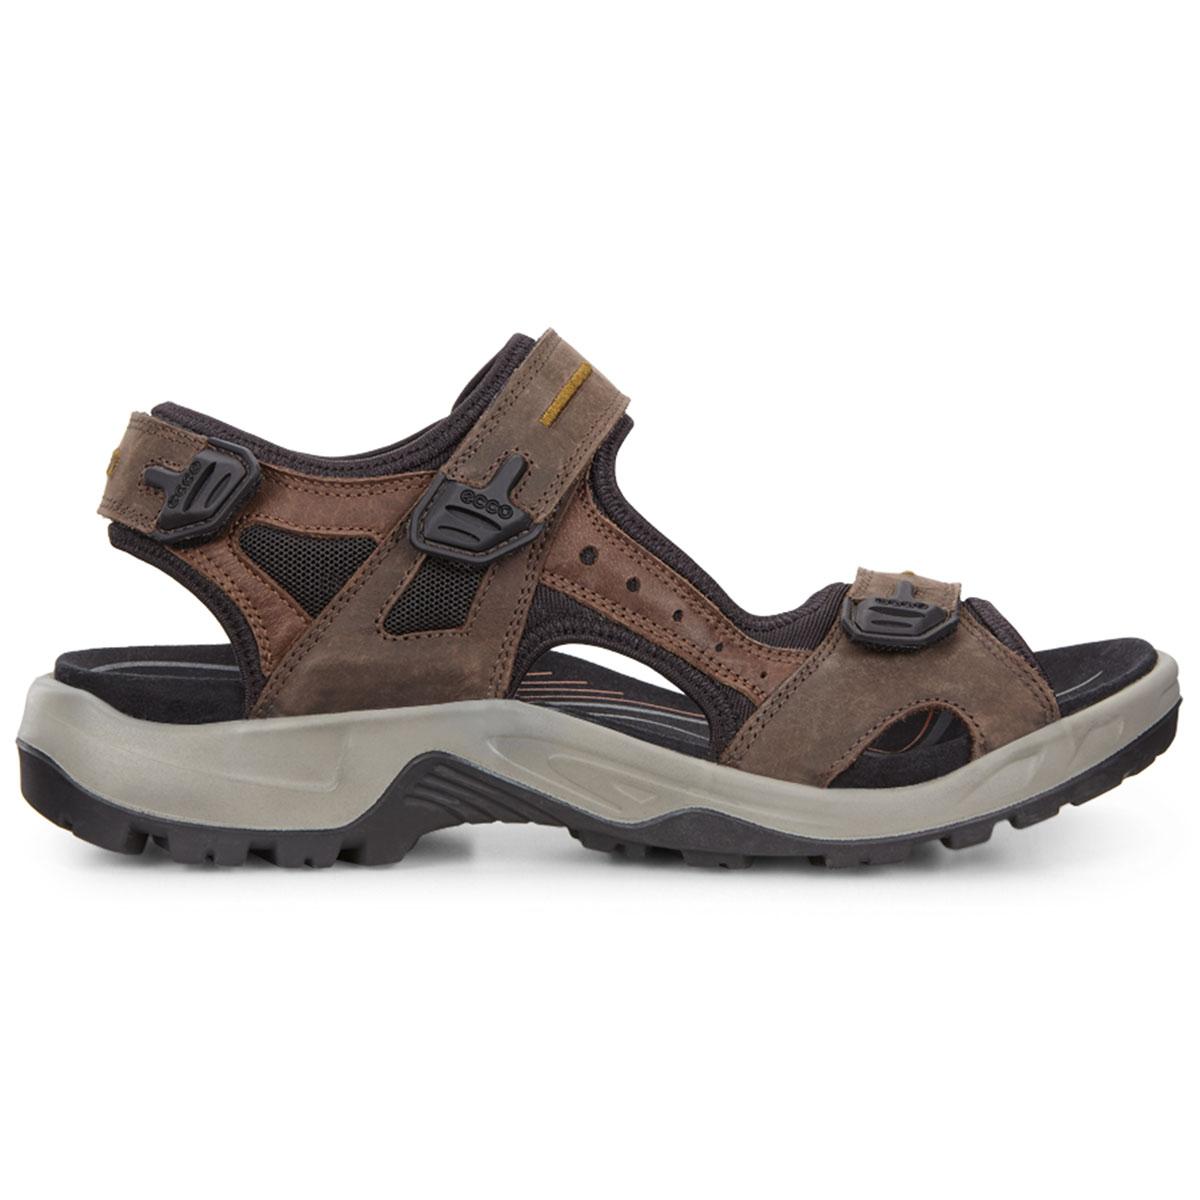 0a0056d6a7d62e ECCO 2017 Mens Offroad Walking Sandals Nubuck Leather Shoes UK 7.5 ...